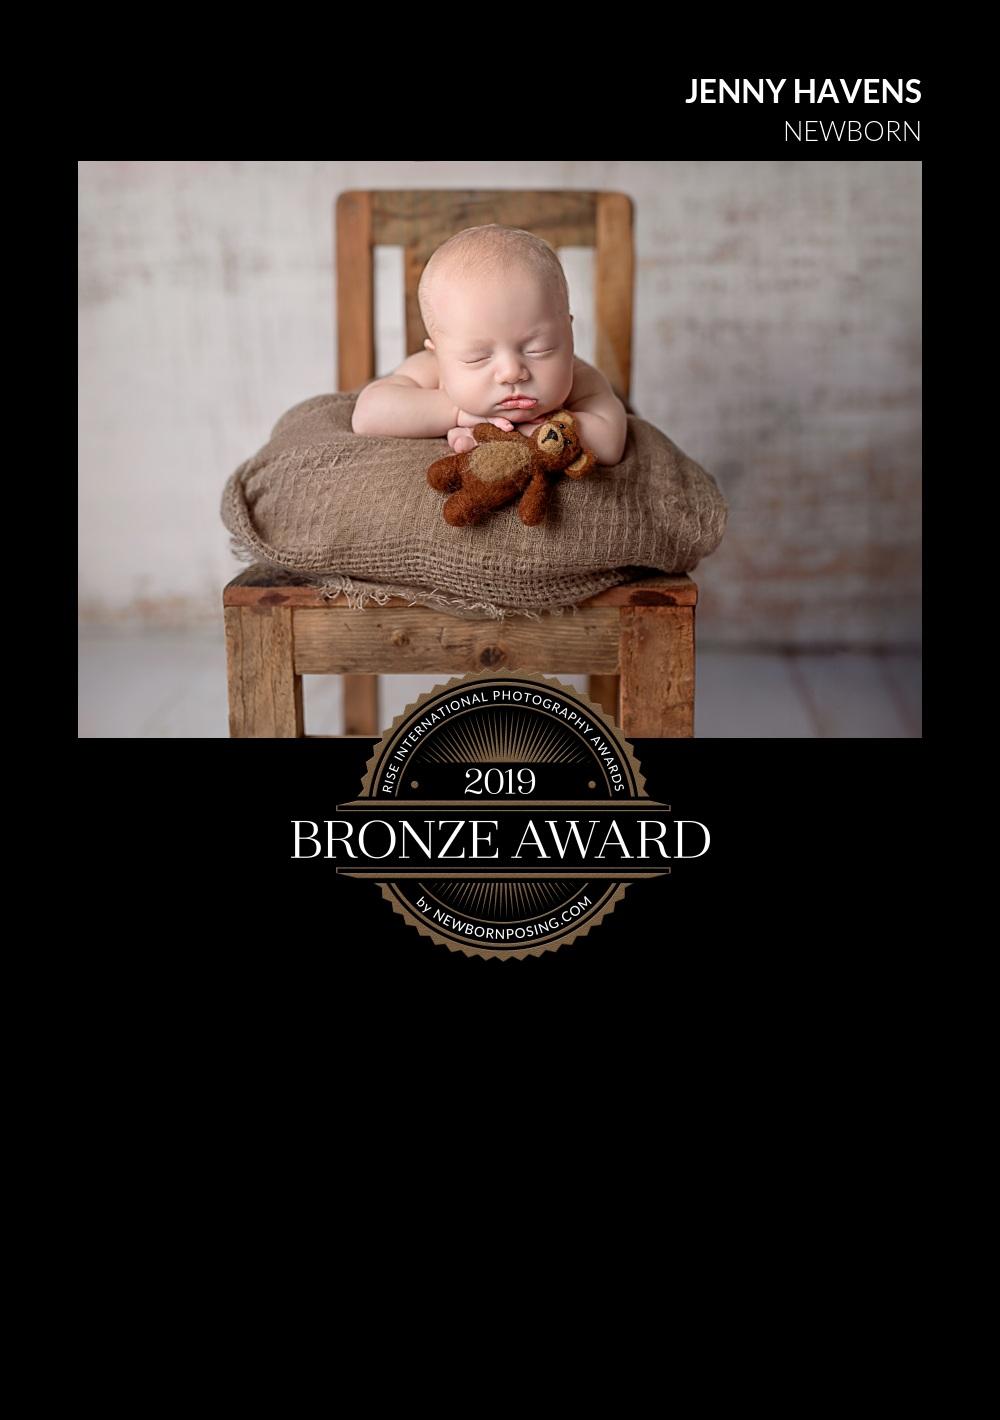 2019 Rise International Photography Award - Bronze Winner - Newborn Category -